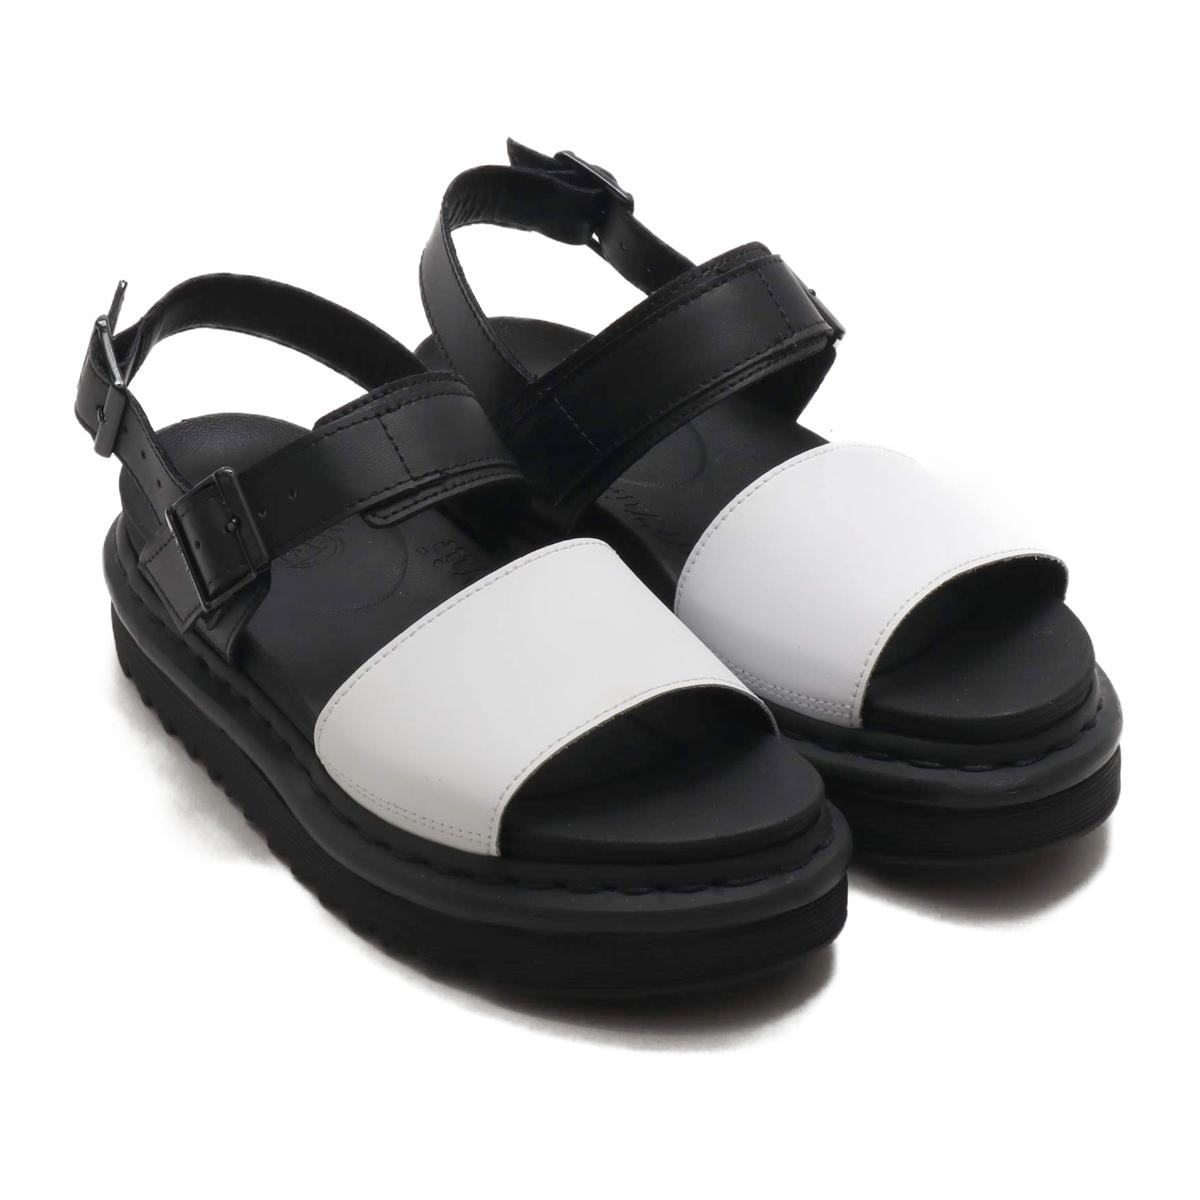 Dr.Martens Voss Strap Sandal (ドクターマーチン ボス ストラップ サンダル)Black/White Hydro Leather【レディース サンダル】19SS-I